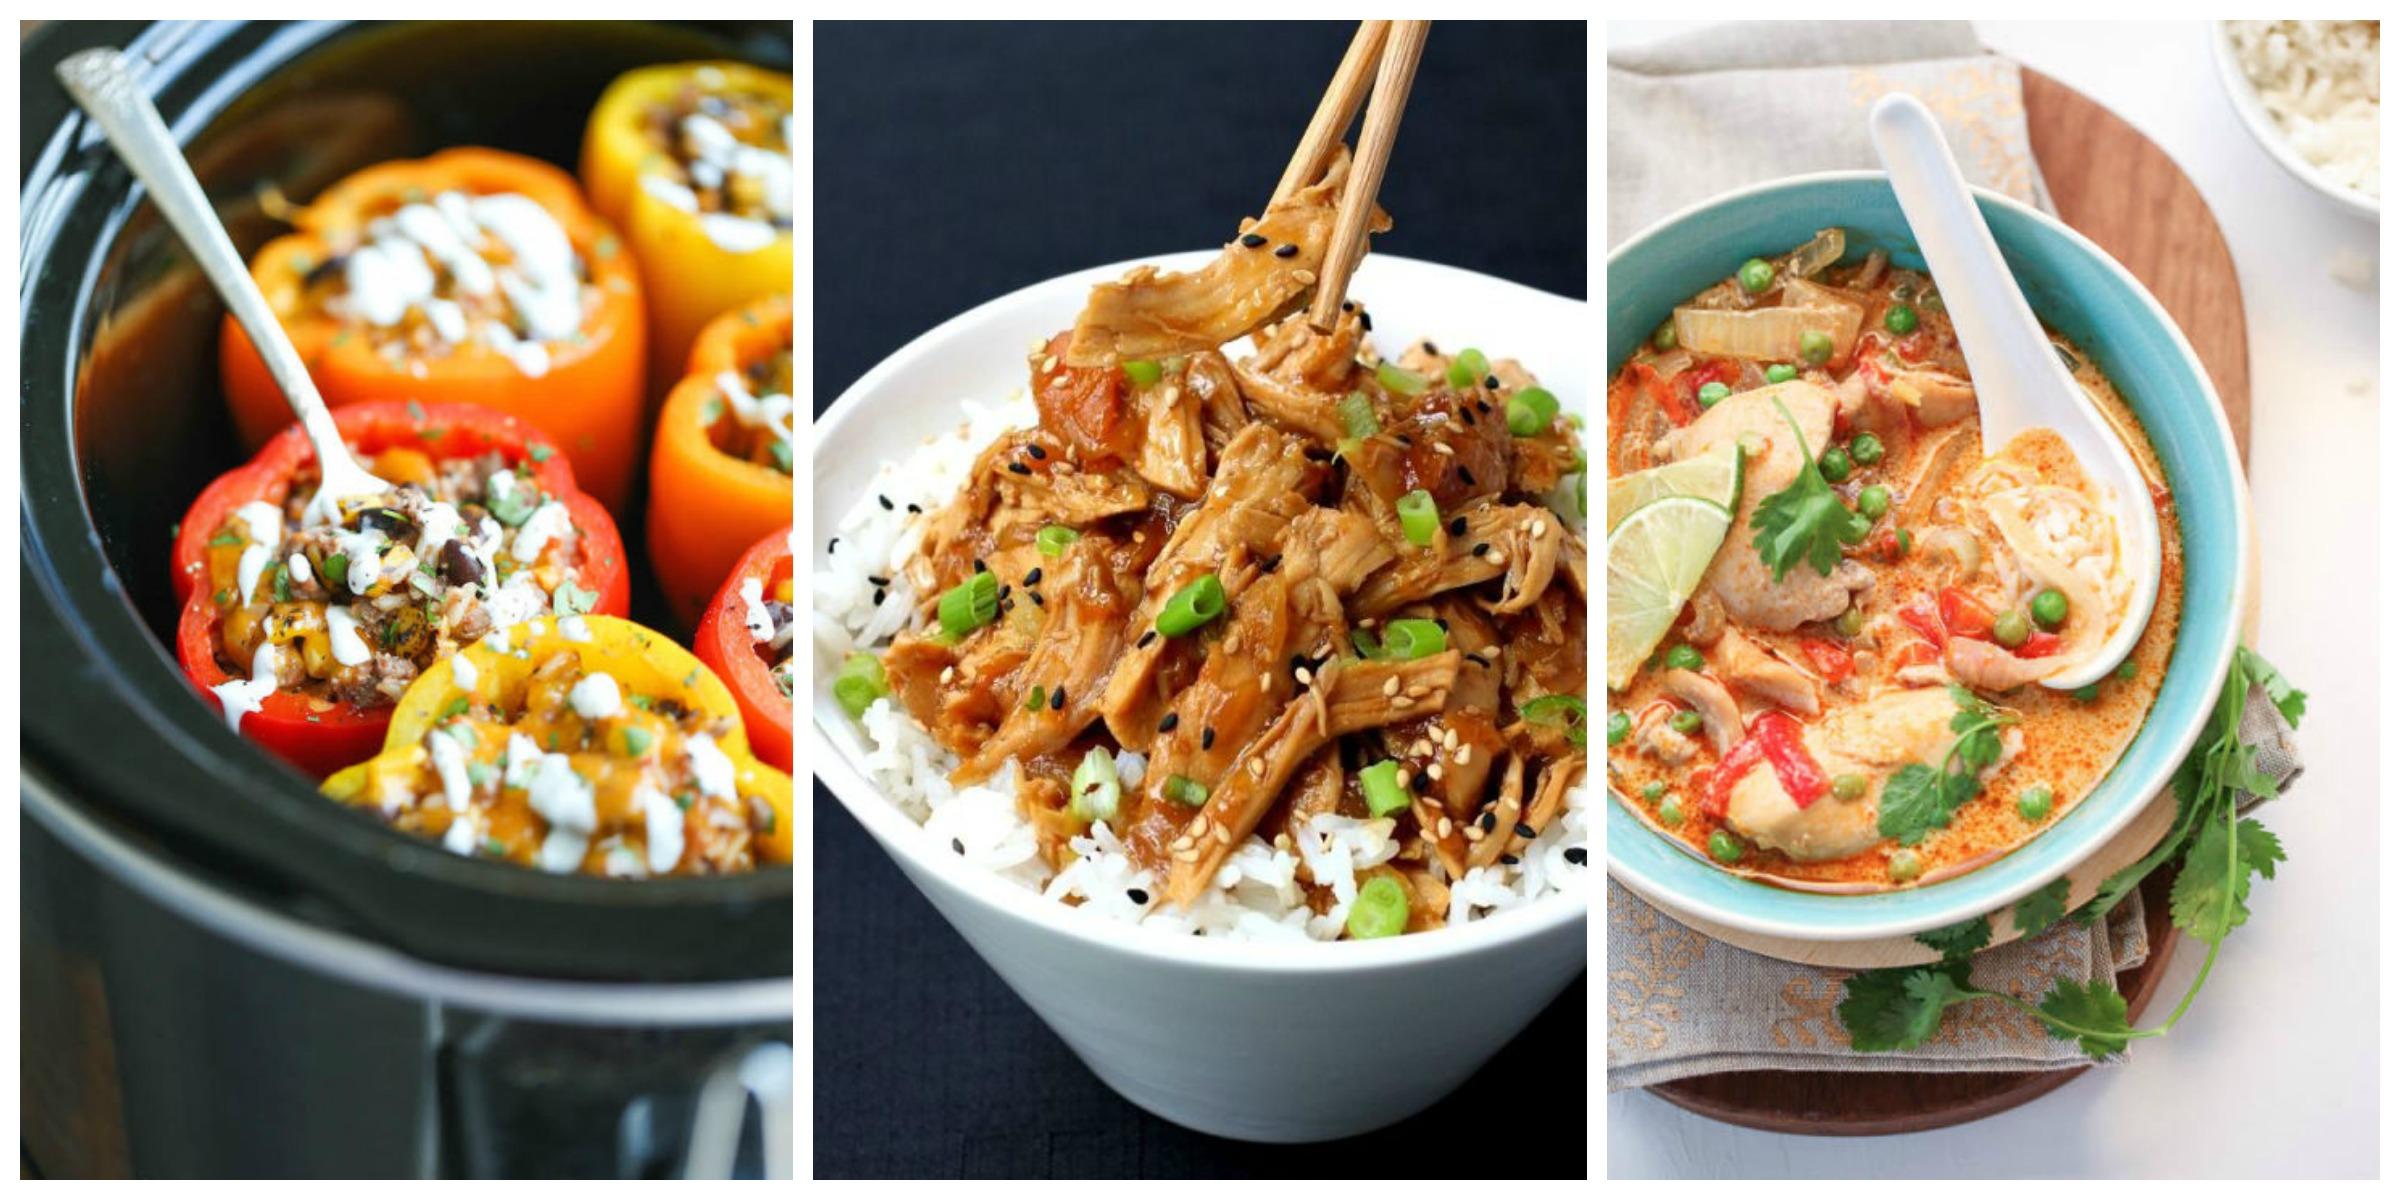 Best healthy dinner options